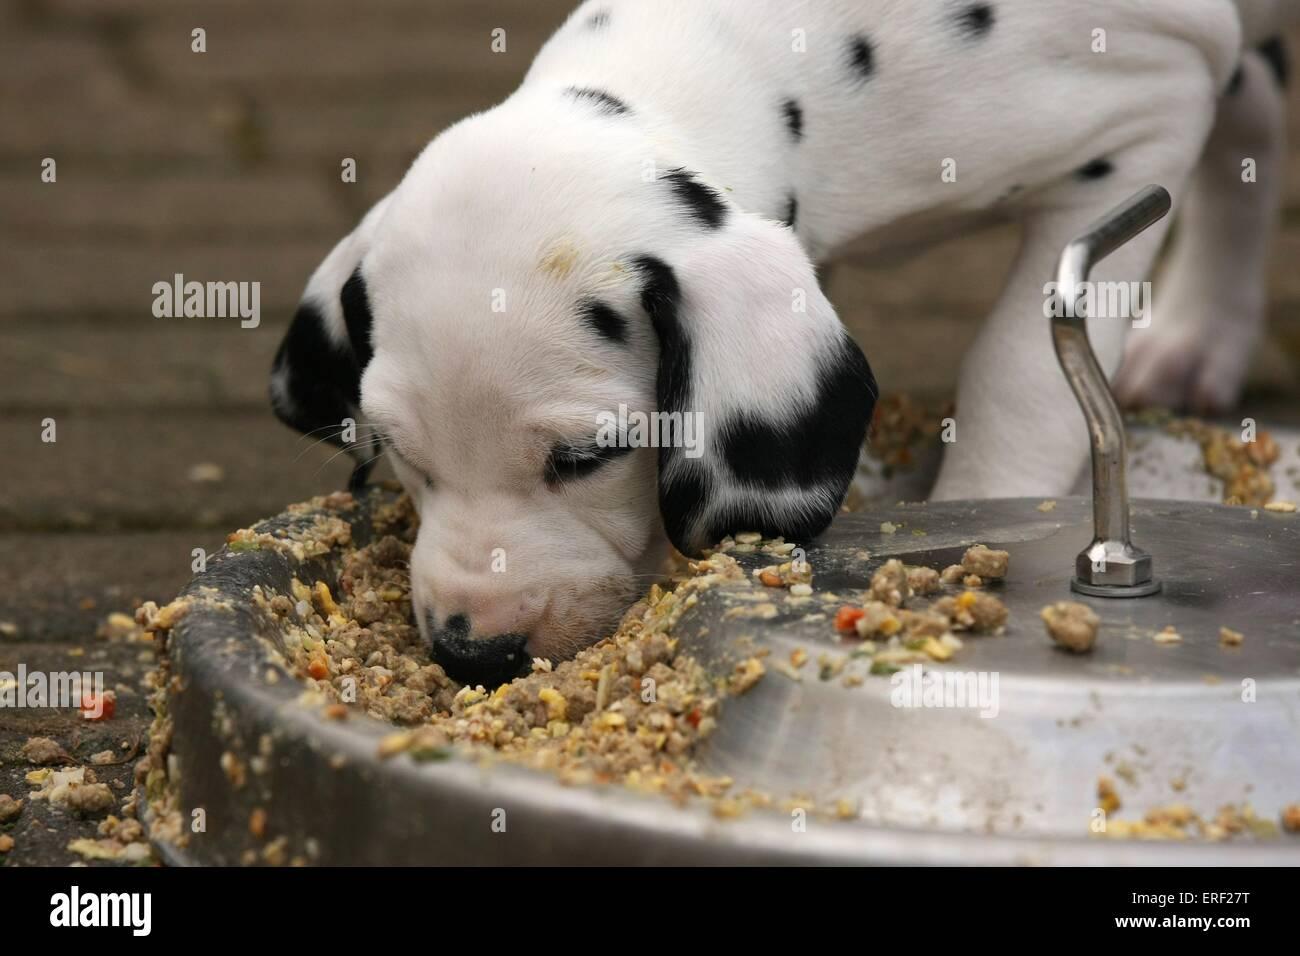 Dalmatian puppy - Stock Image